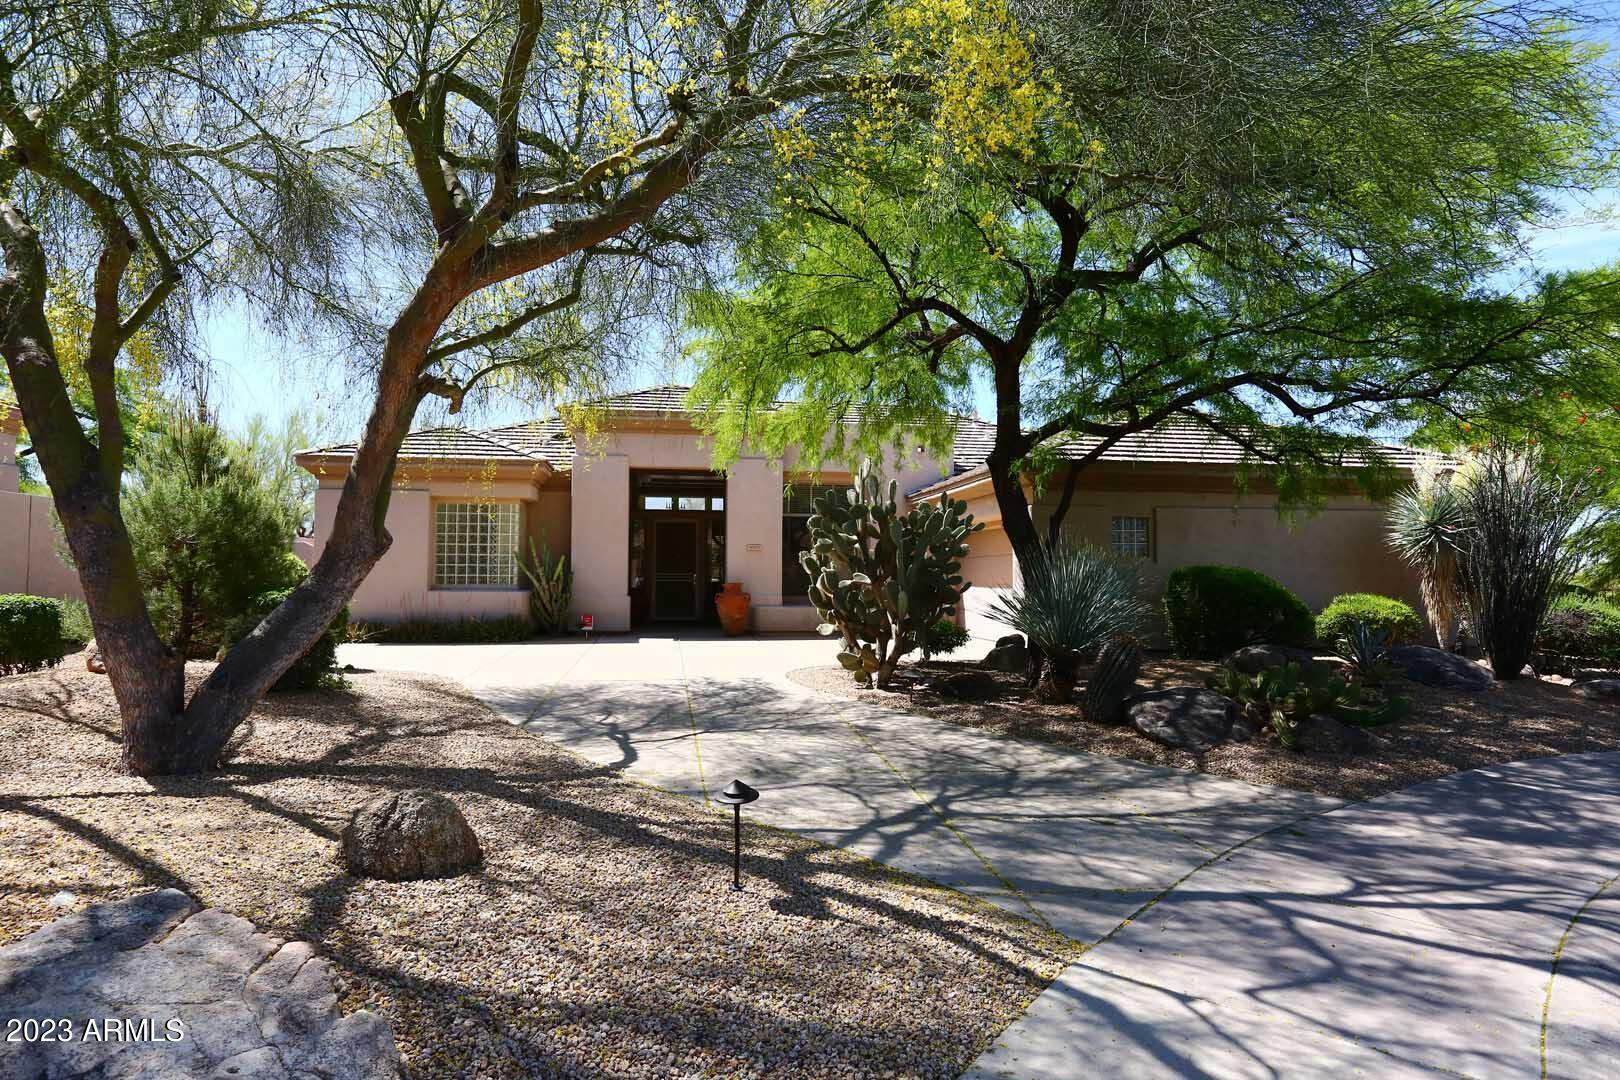 6335 E Marioca Circle, Scottsdale AZ 85266 - Photo 2